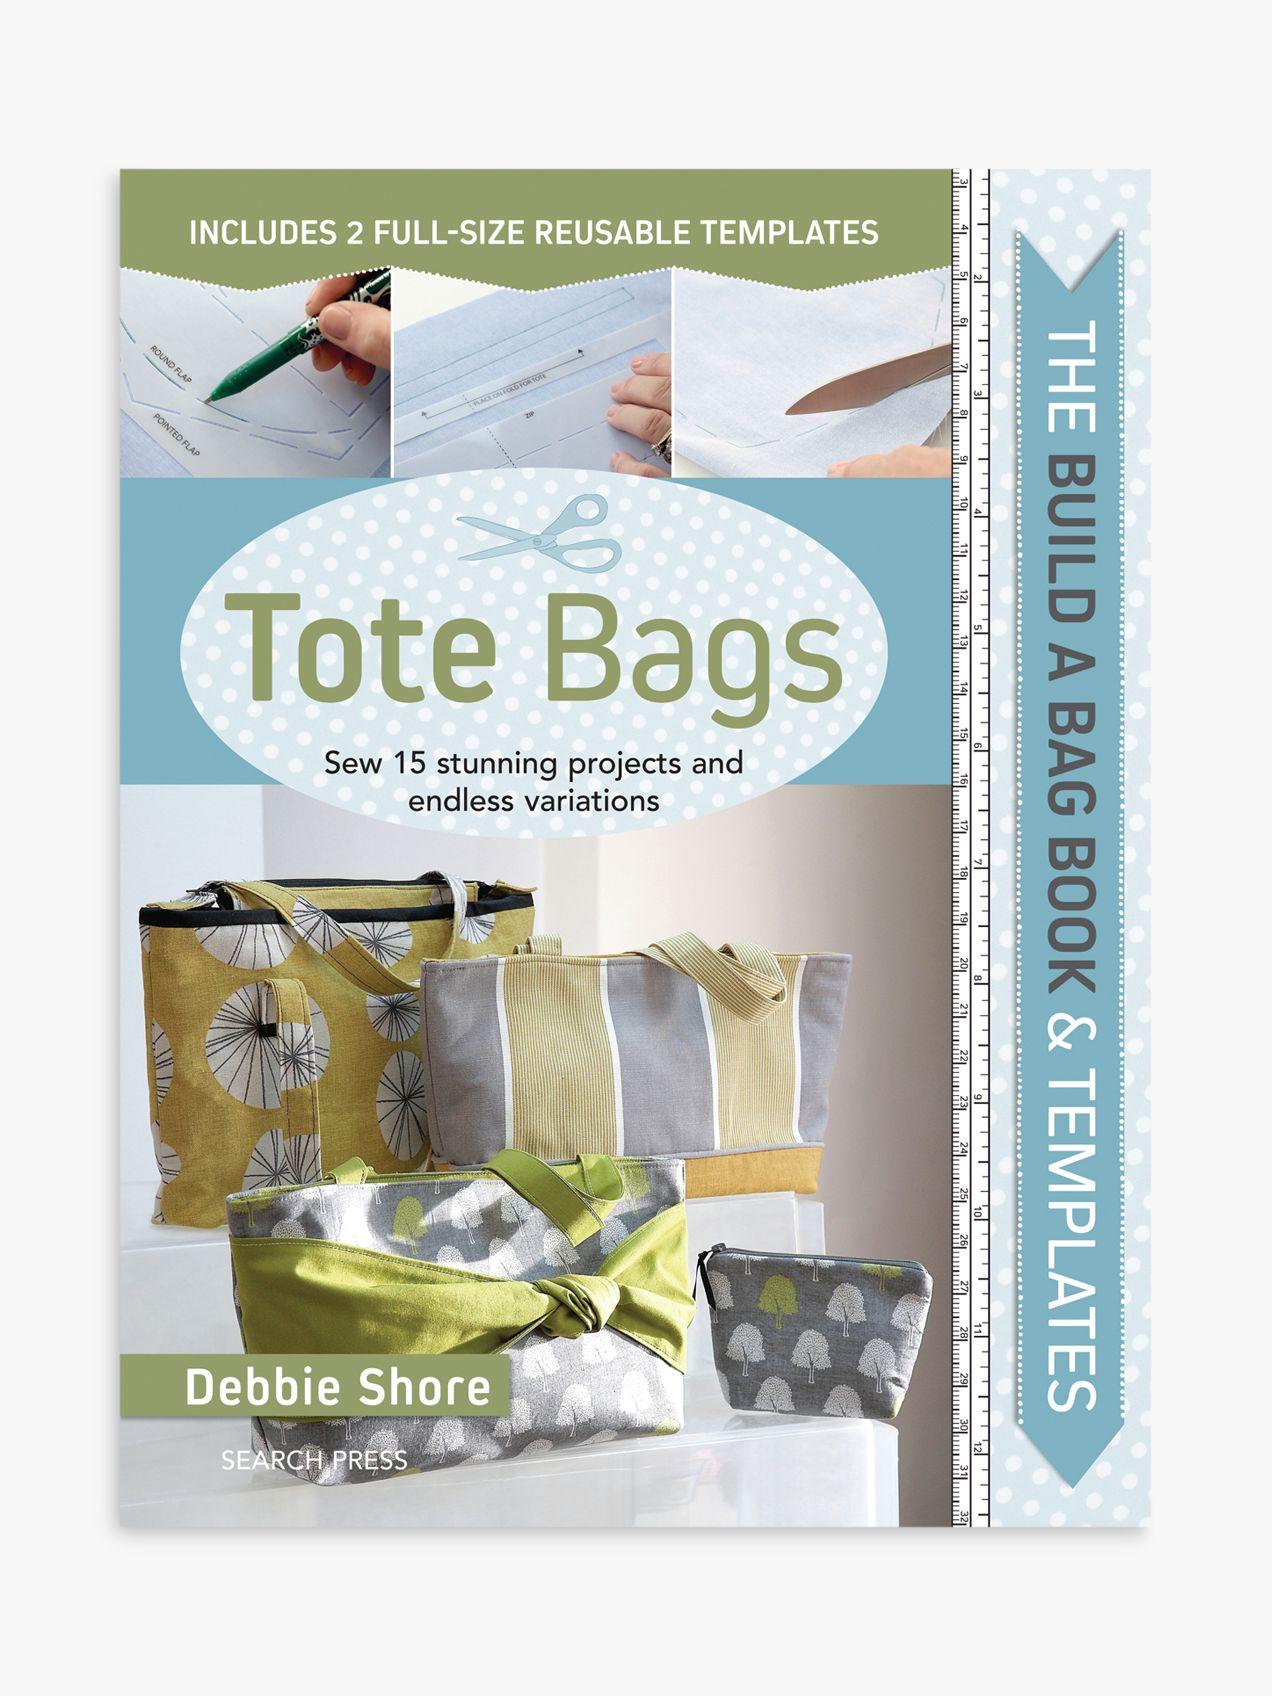 Search Press Search Press Build-A-Bag Tote Bag Sewing Book